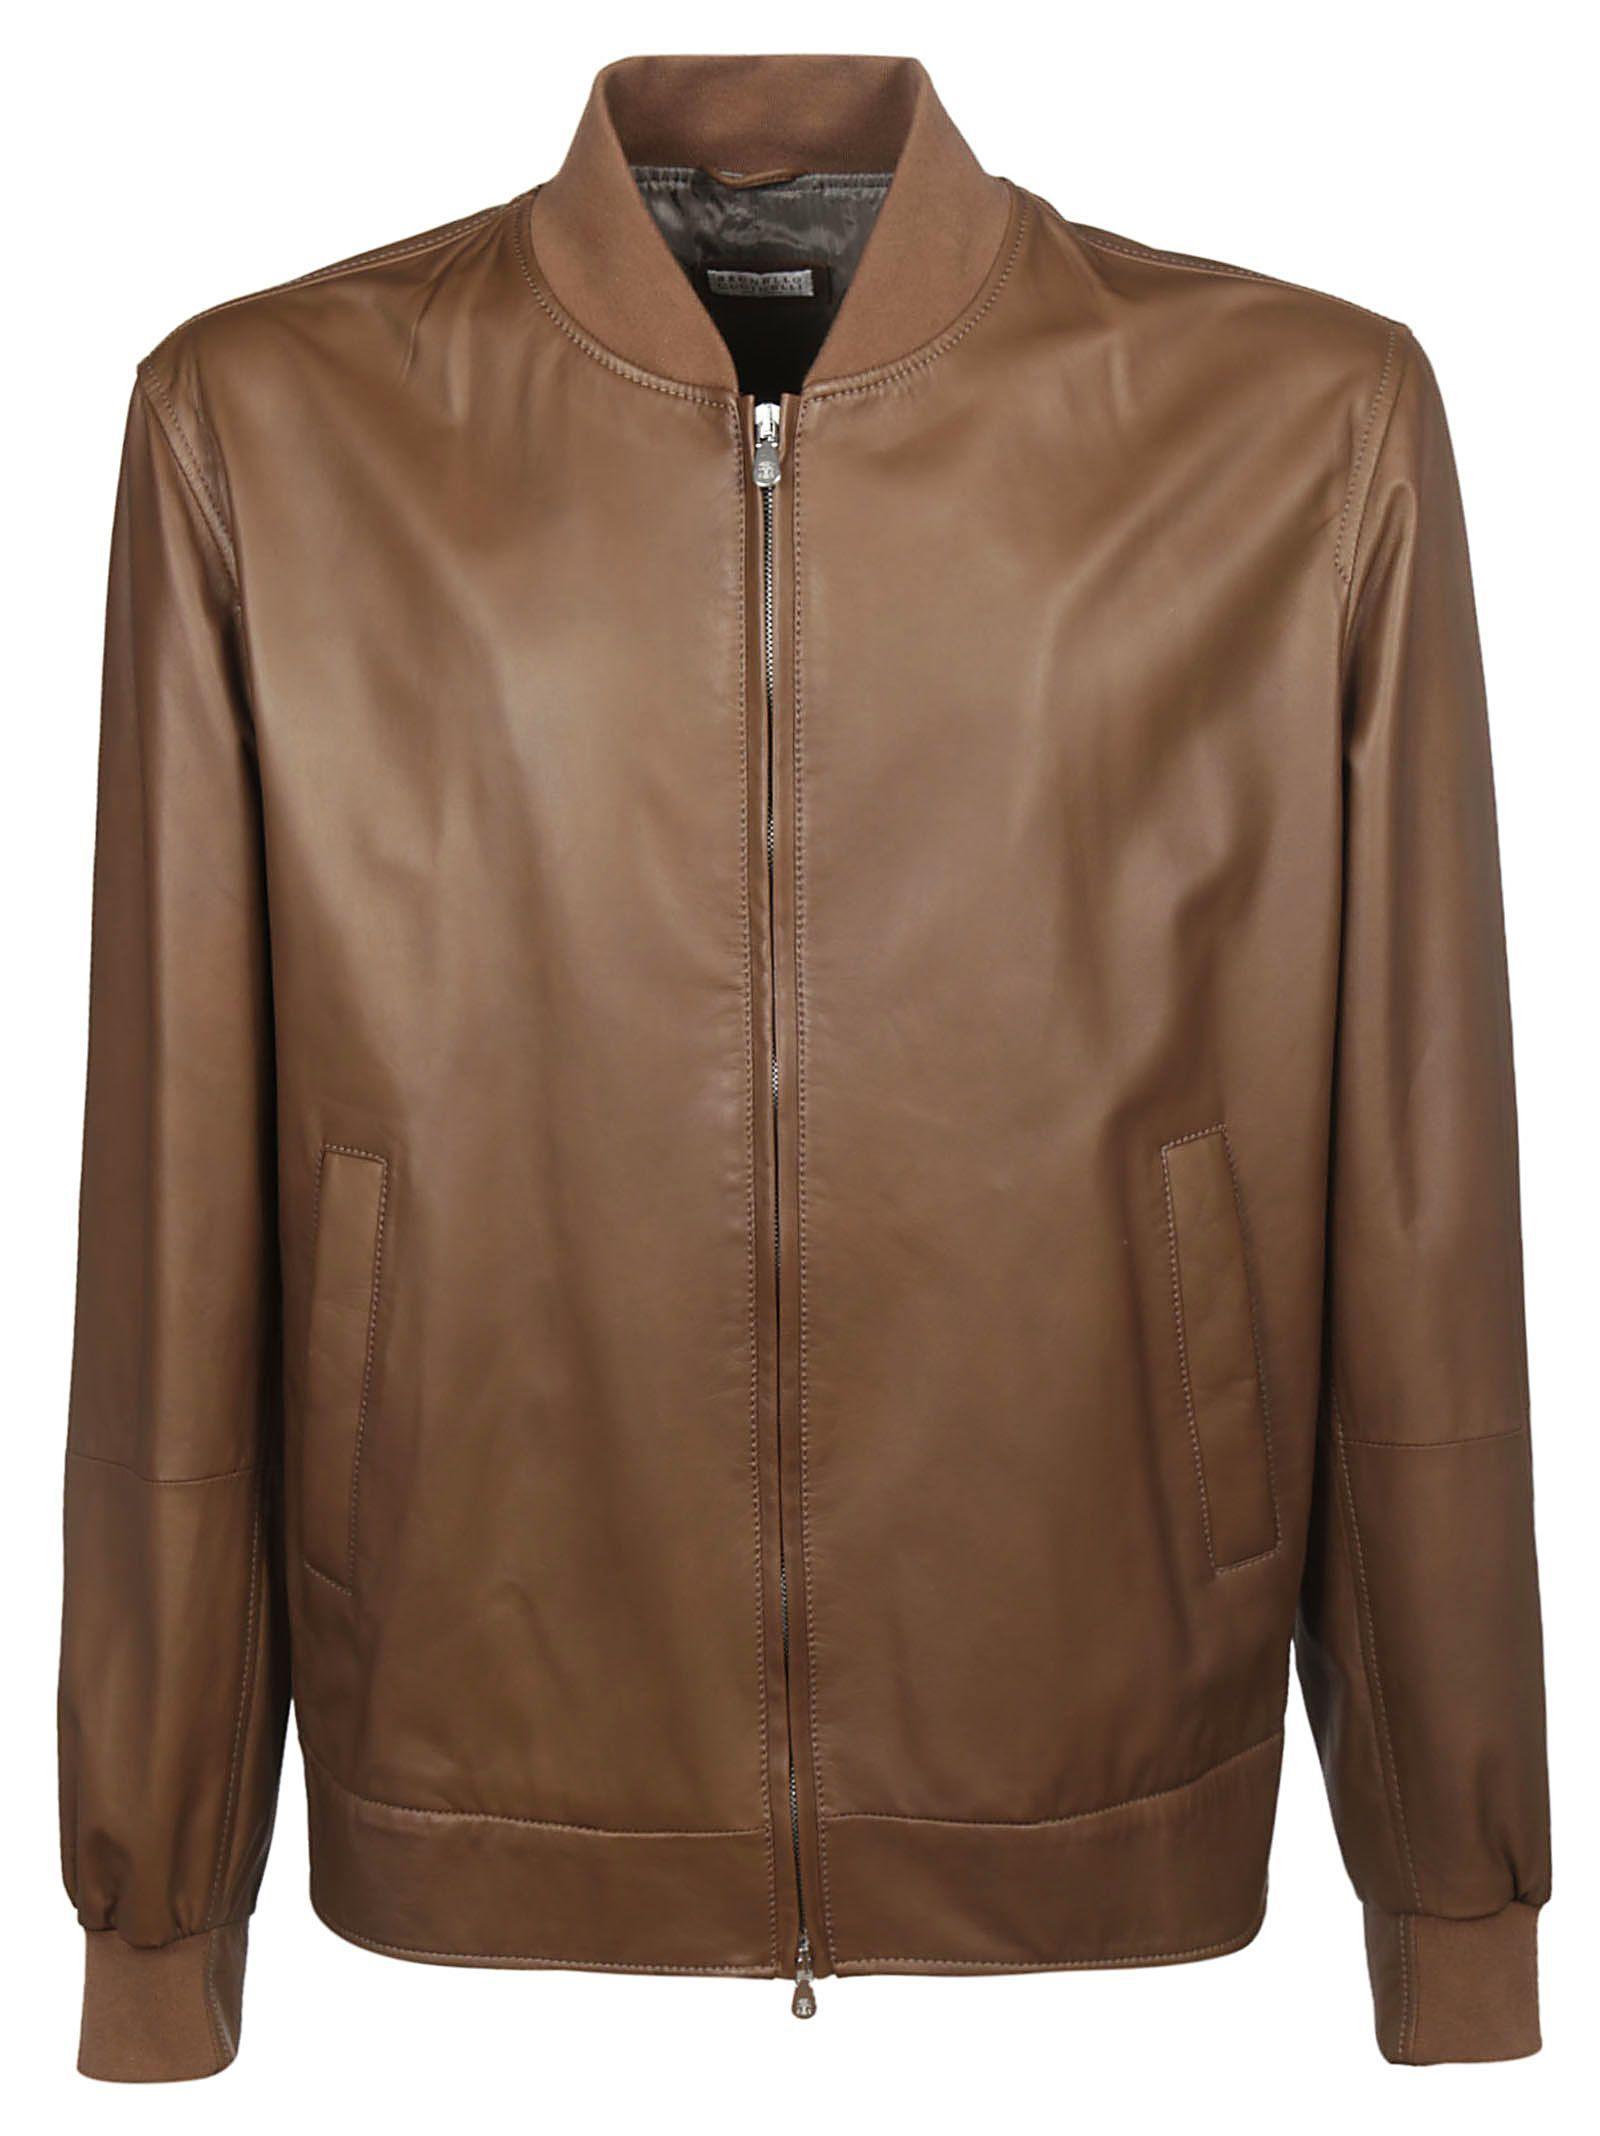 Brunello Cucinelli Zipped Leather Jacket Brunellocucinelli Cloth Zipped Leather Jacket Leather Jacket Jackets [ 2136 x 1600 Pixel ]